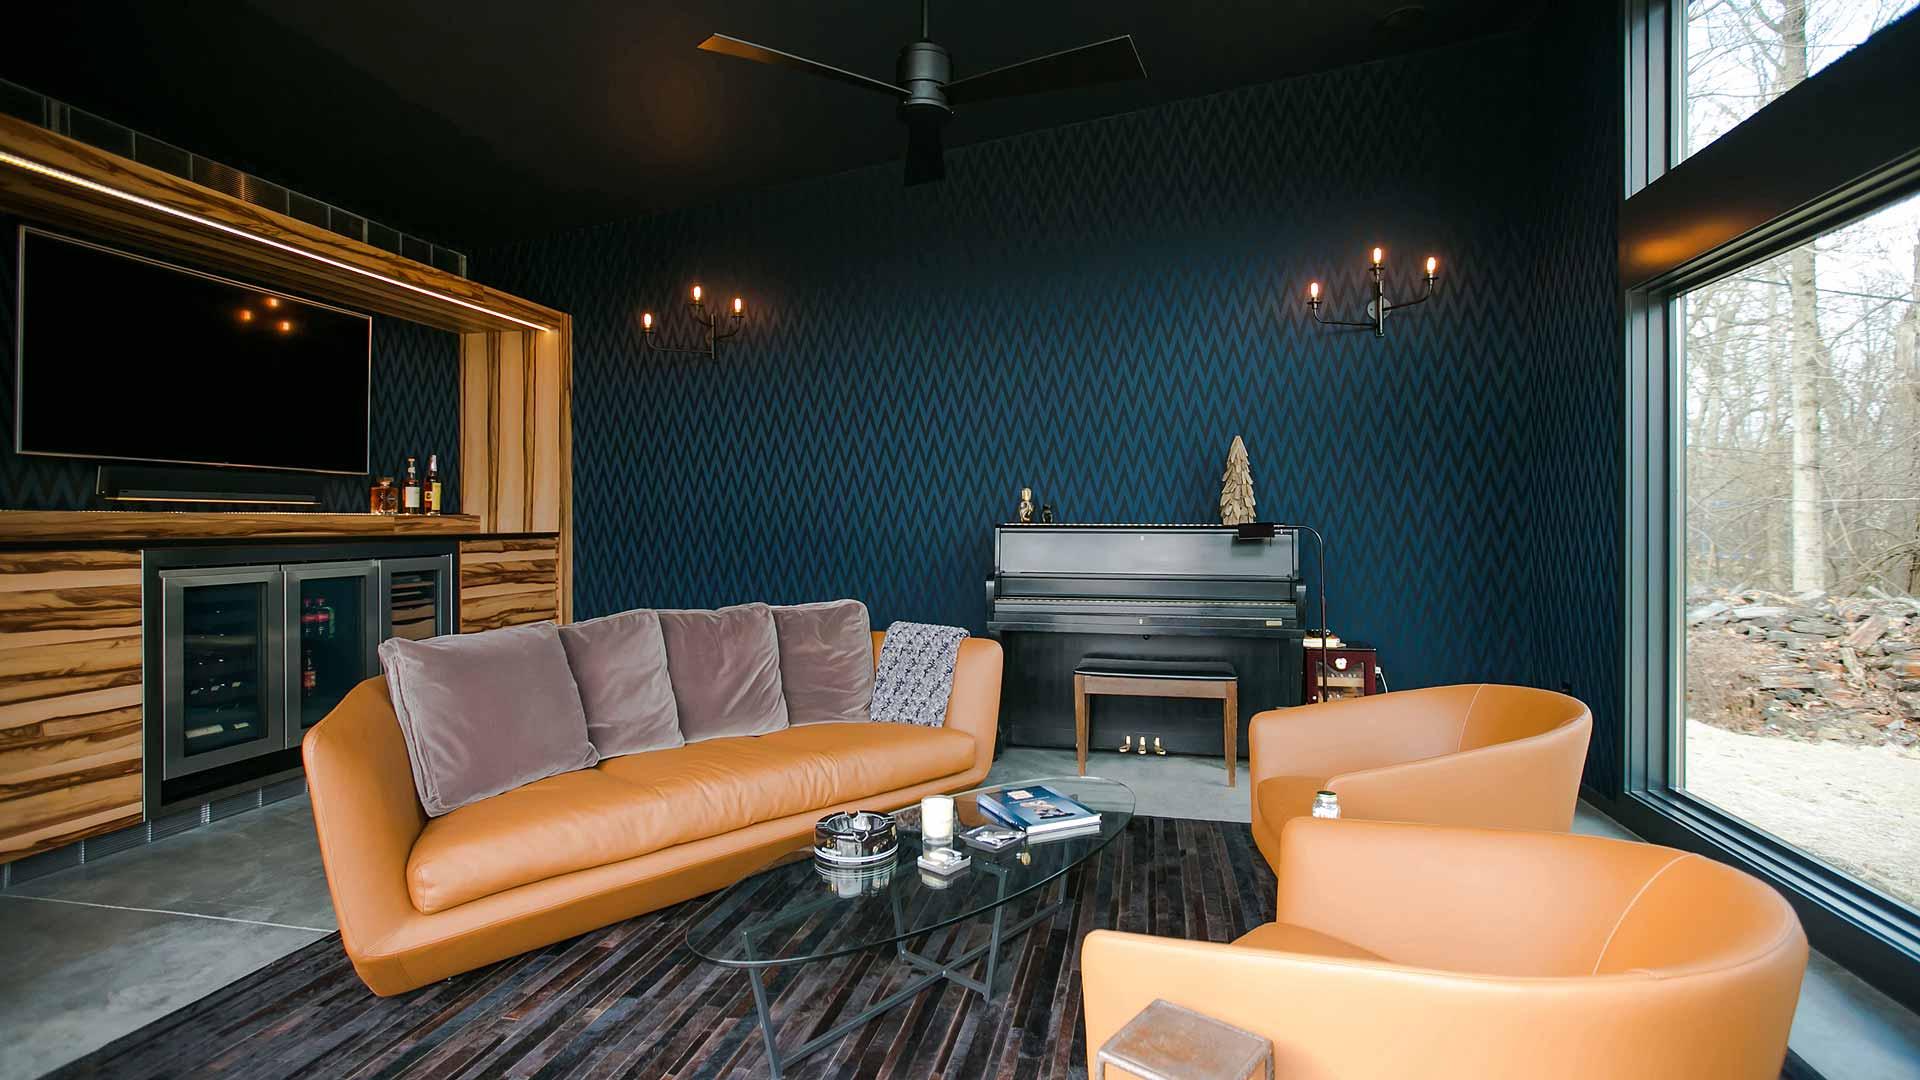 Cigar Room Addition - Piano - Humidor - orange leather sofa - dark wallcovering - Midcentury Modern Addition - Brendonwood, Indianapolis